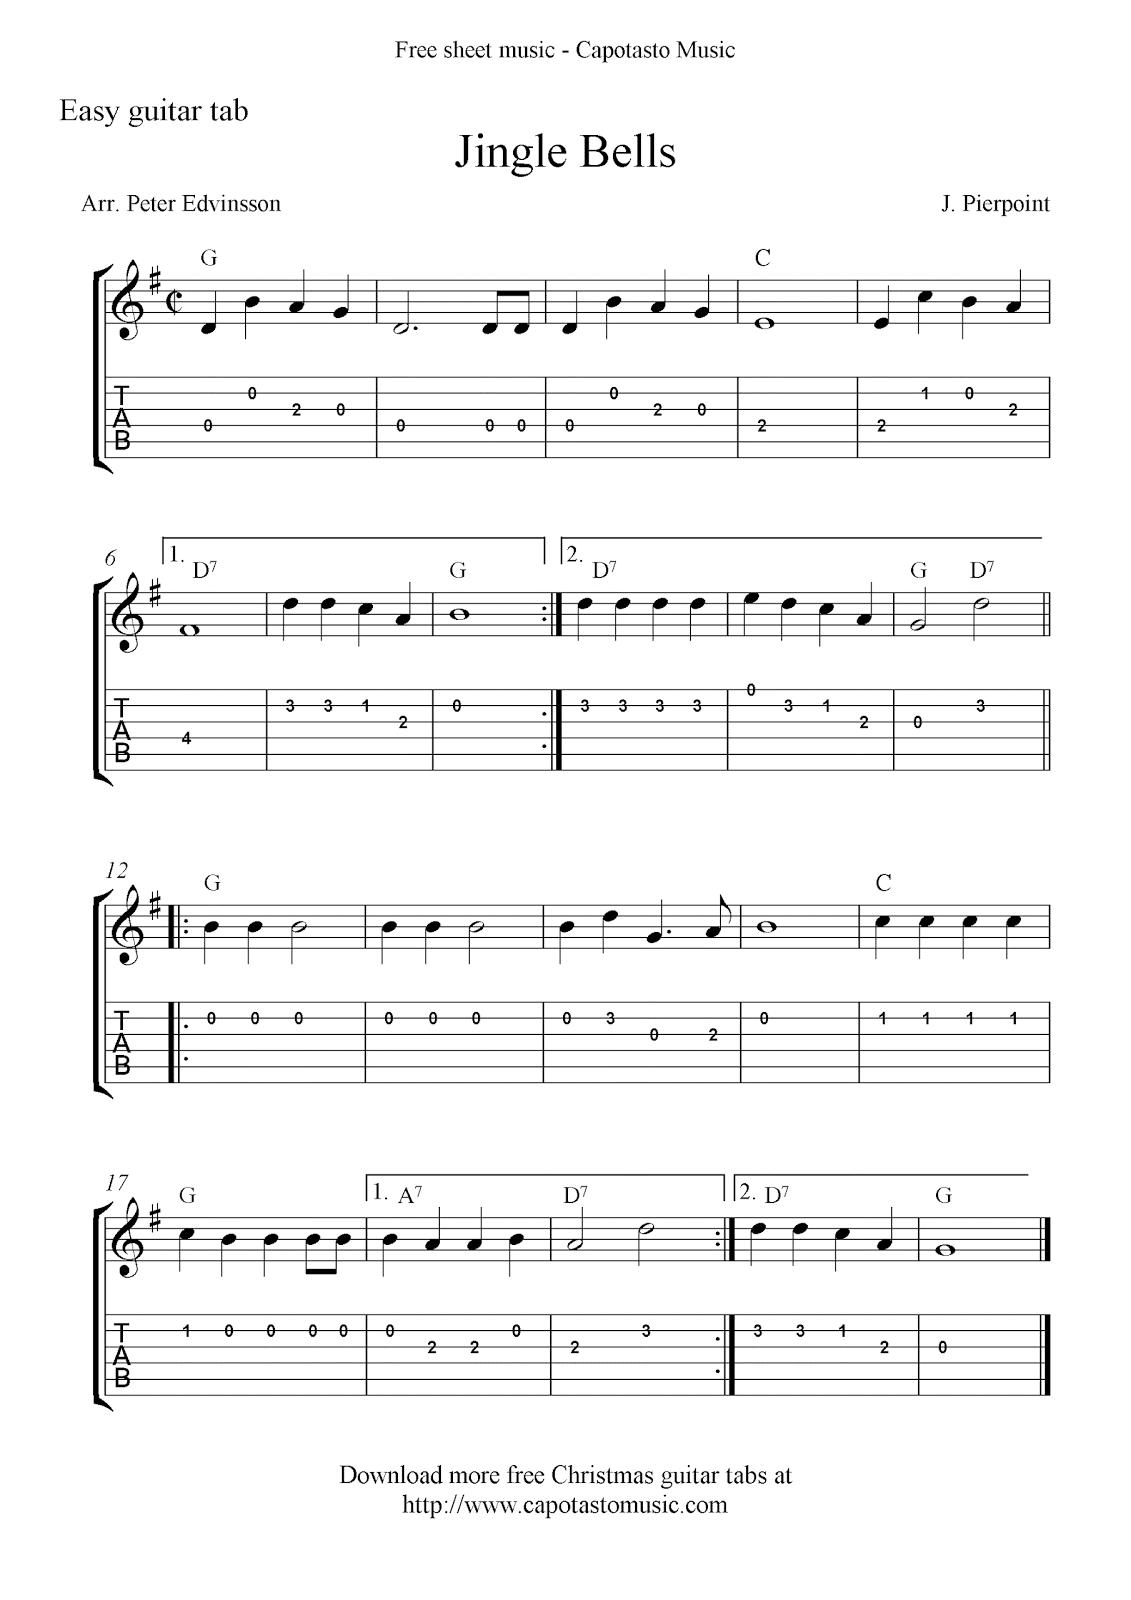 Free Christmas Carol Sheet Music